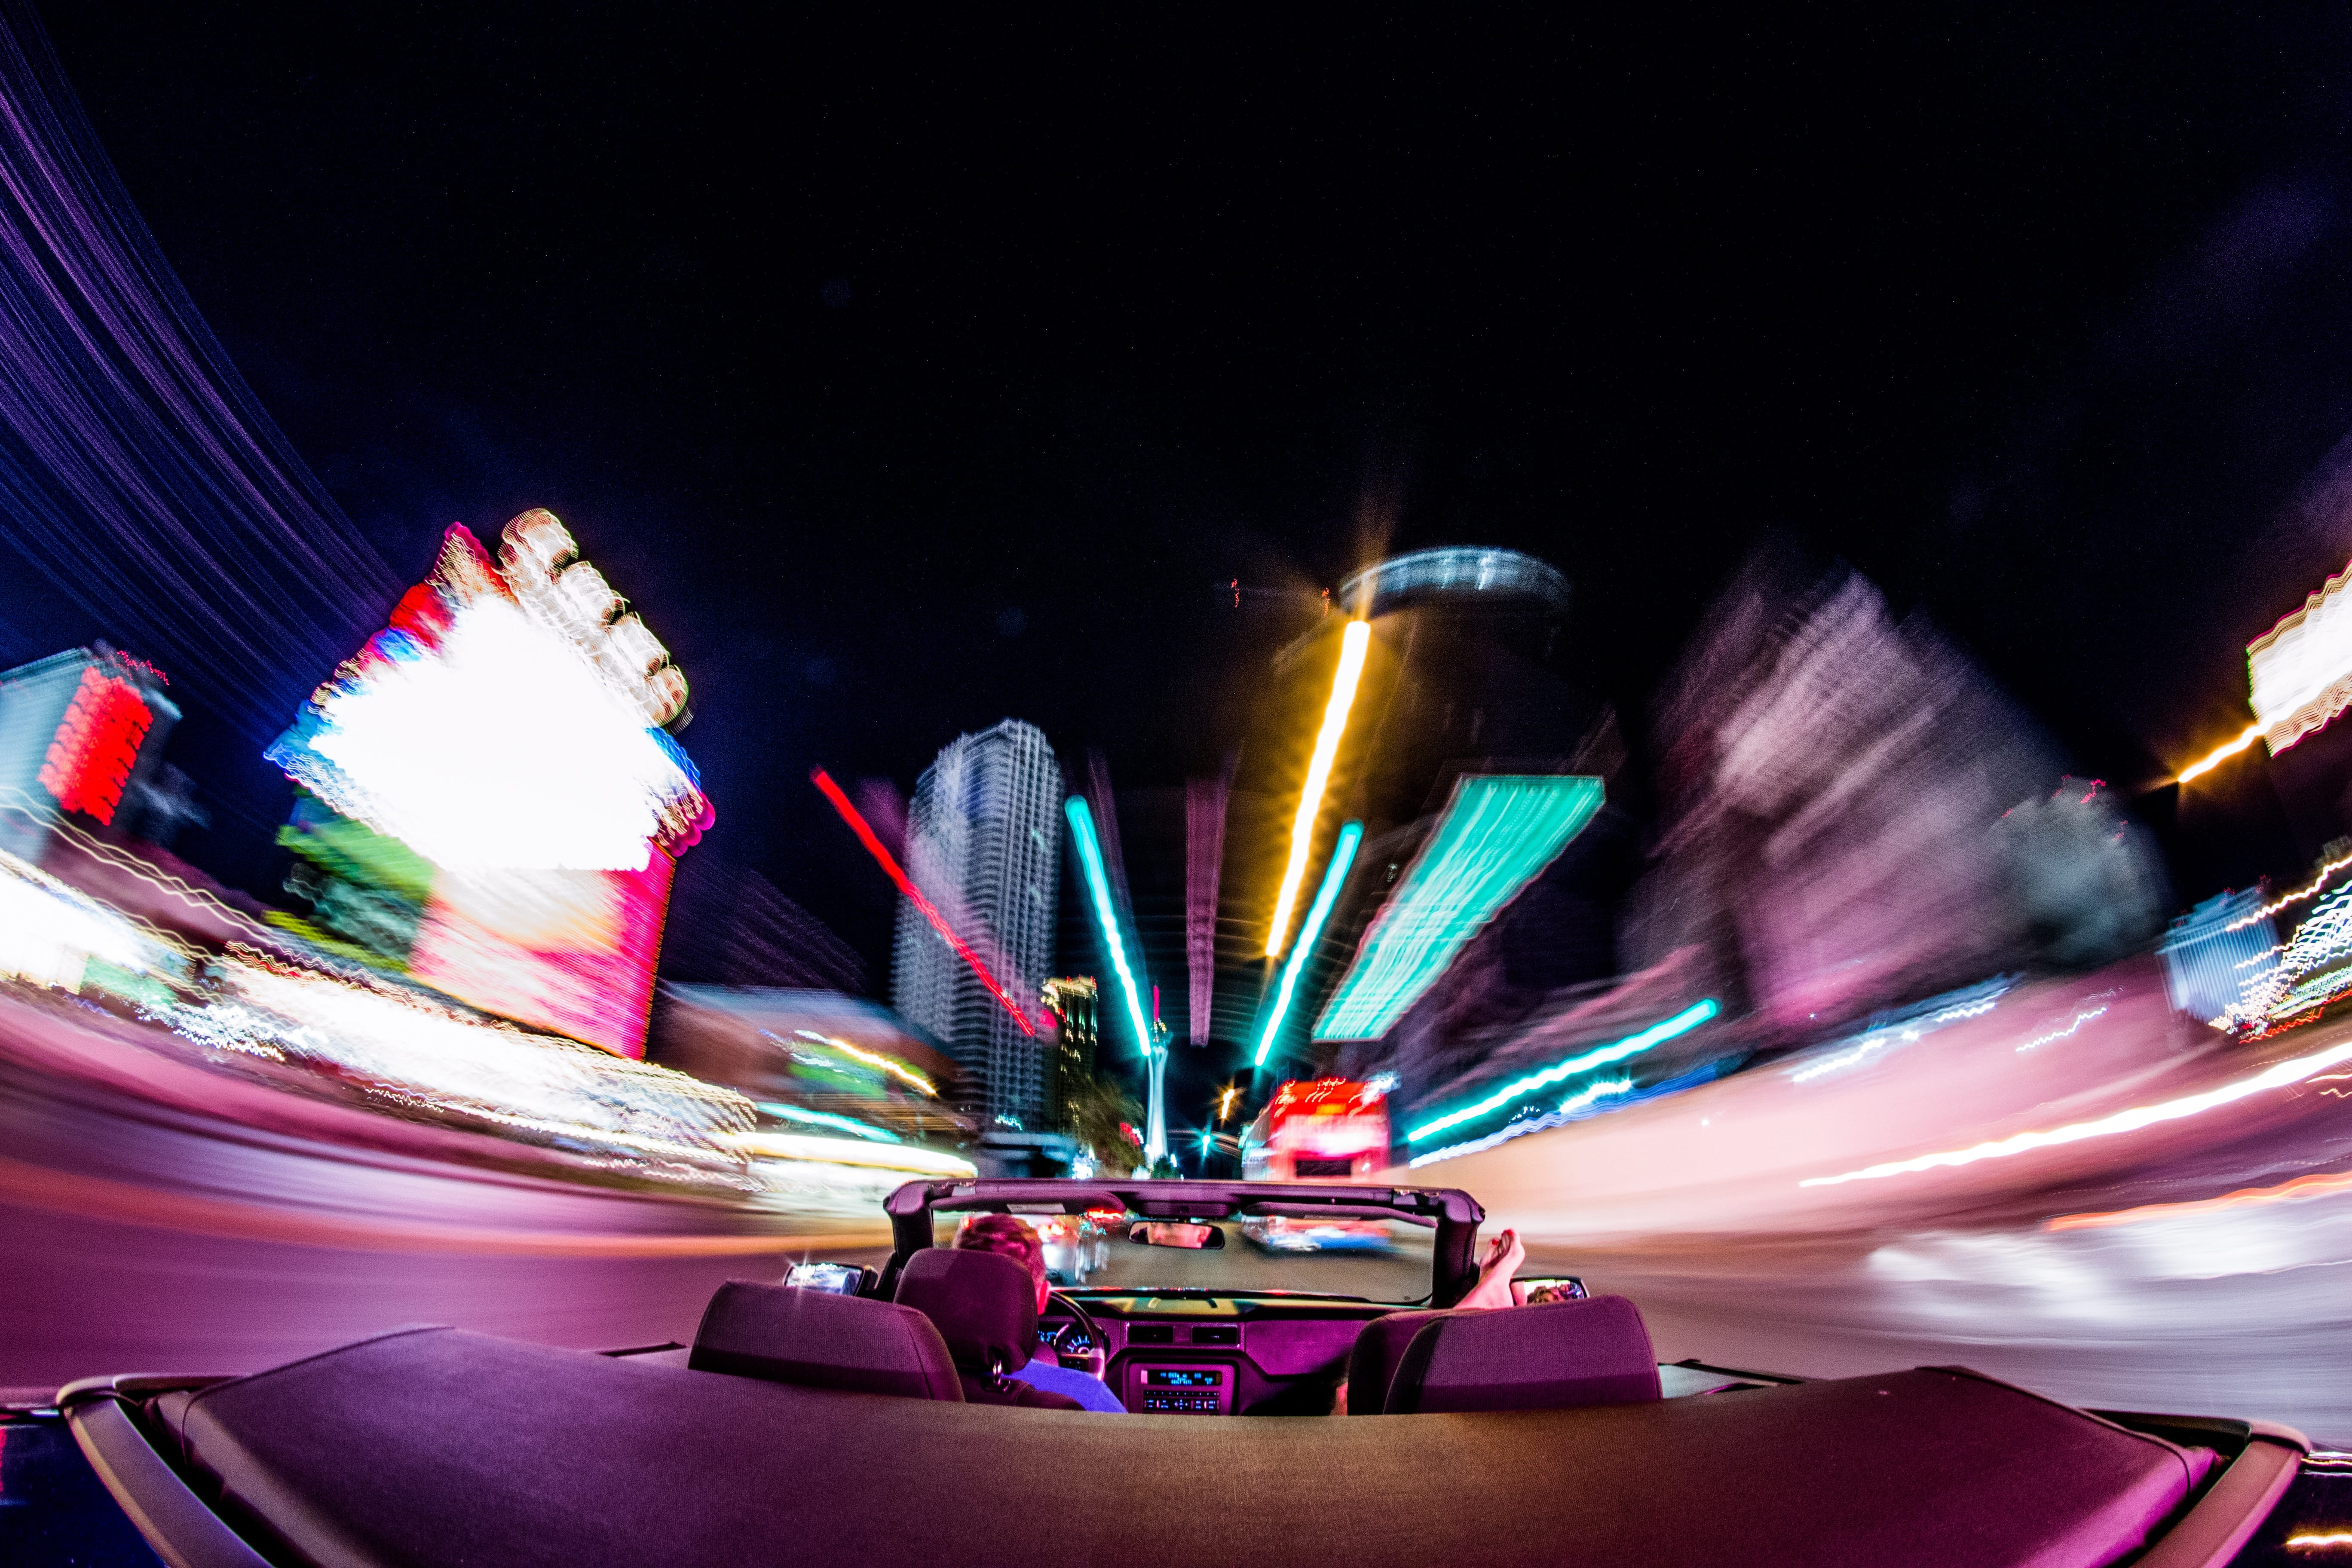 Timelapse photograph of driving in Las Vegas at night; image by Jakub Gorajek, via Unsplash.com.